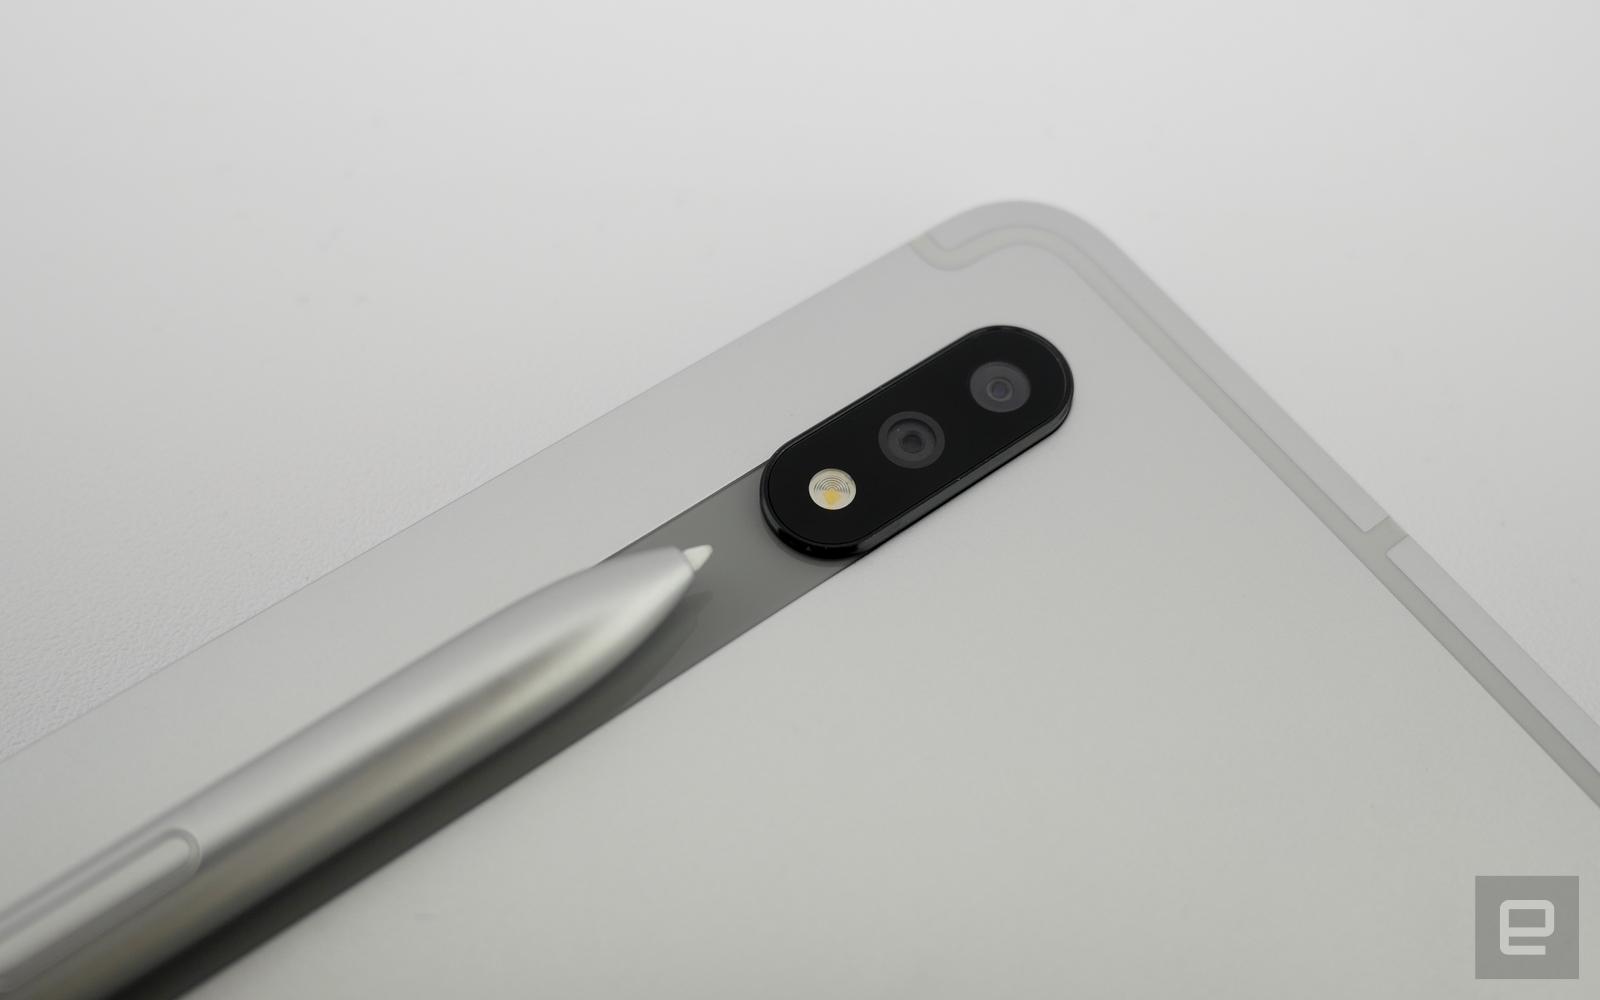 Samsung Galaxy Tab S7 series